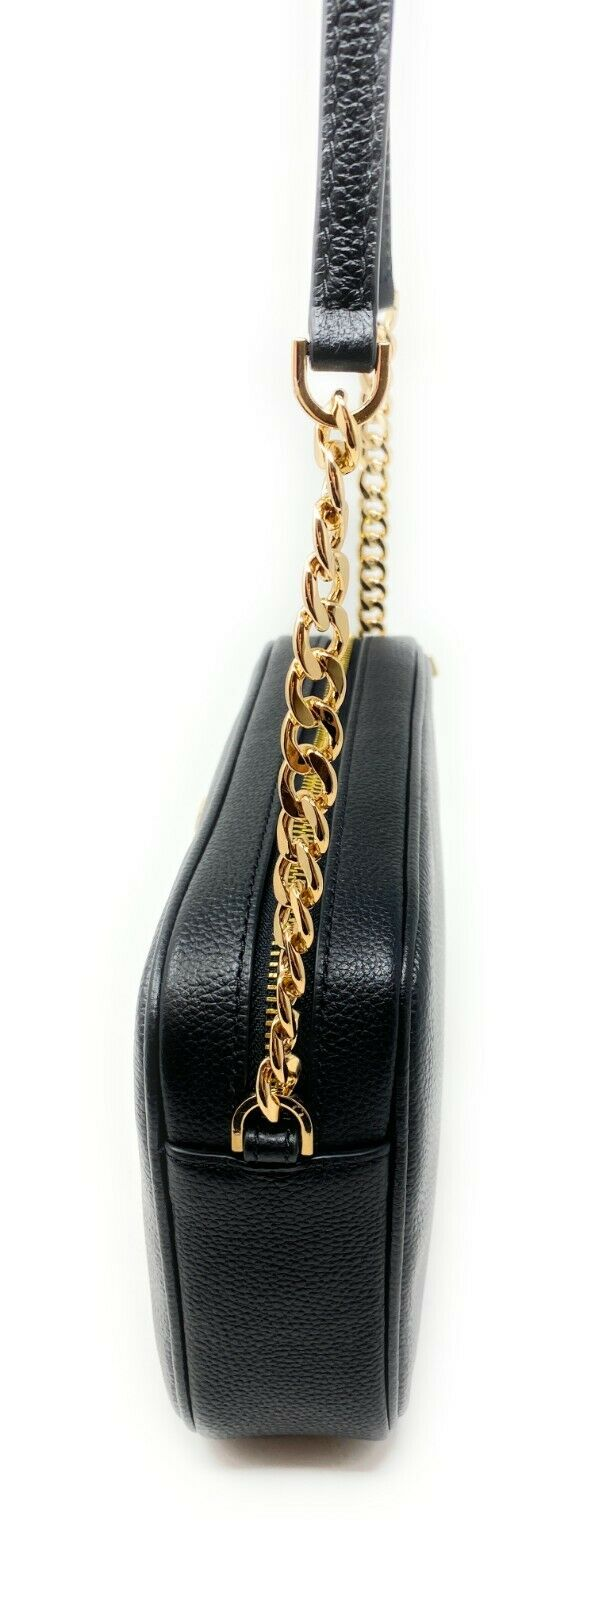 thumbnail 94 - Michael Kors Jet Set Item Large East West Crossbody Chain Handbag Clutch $298